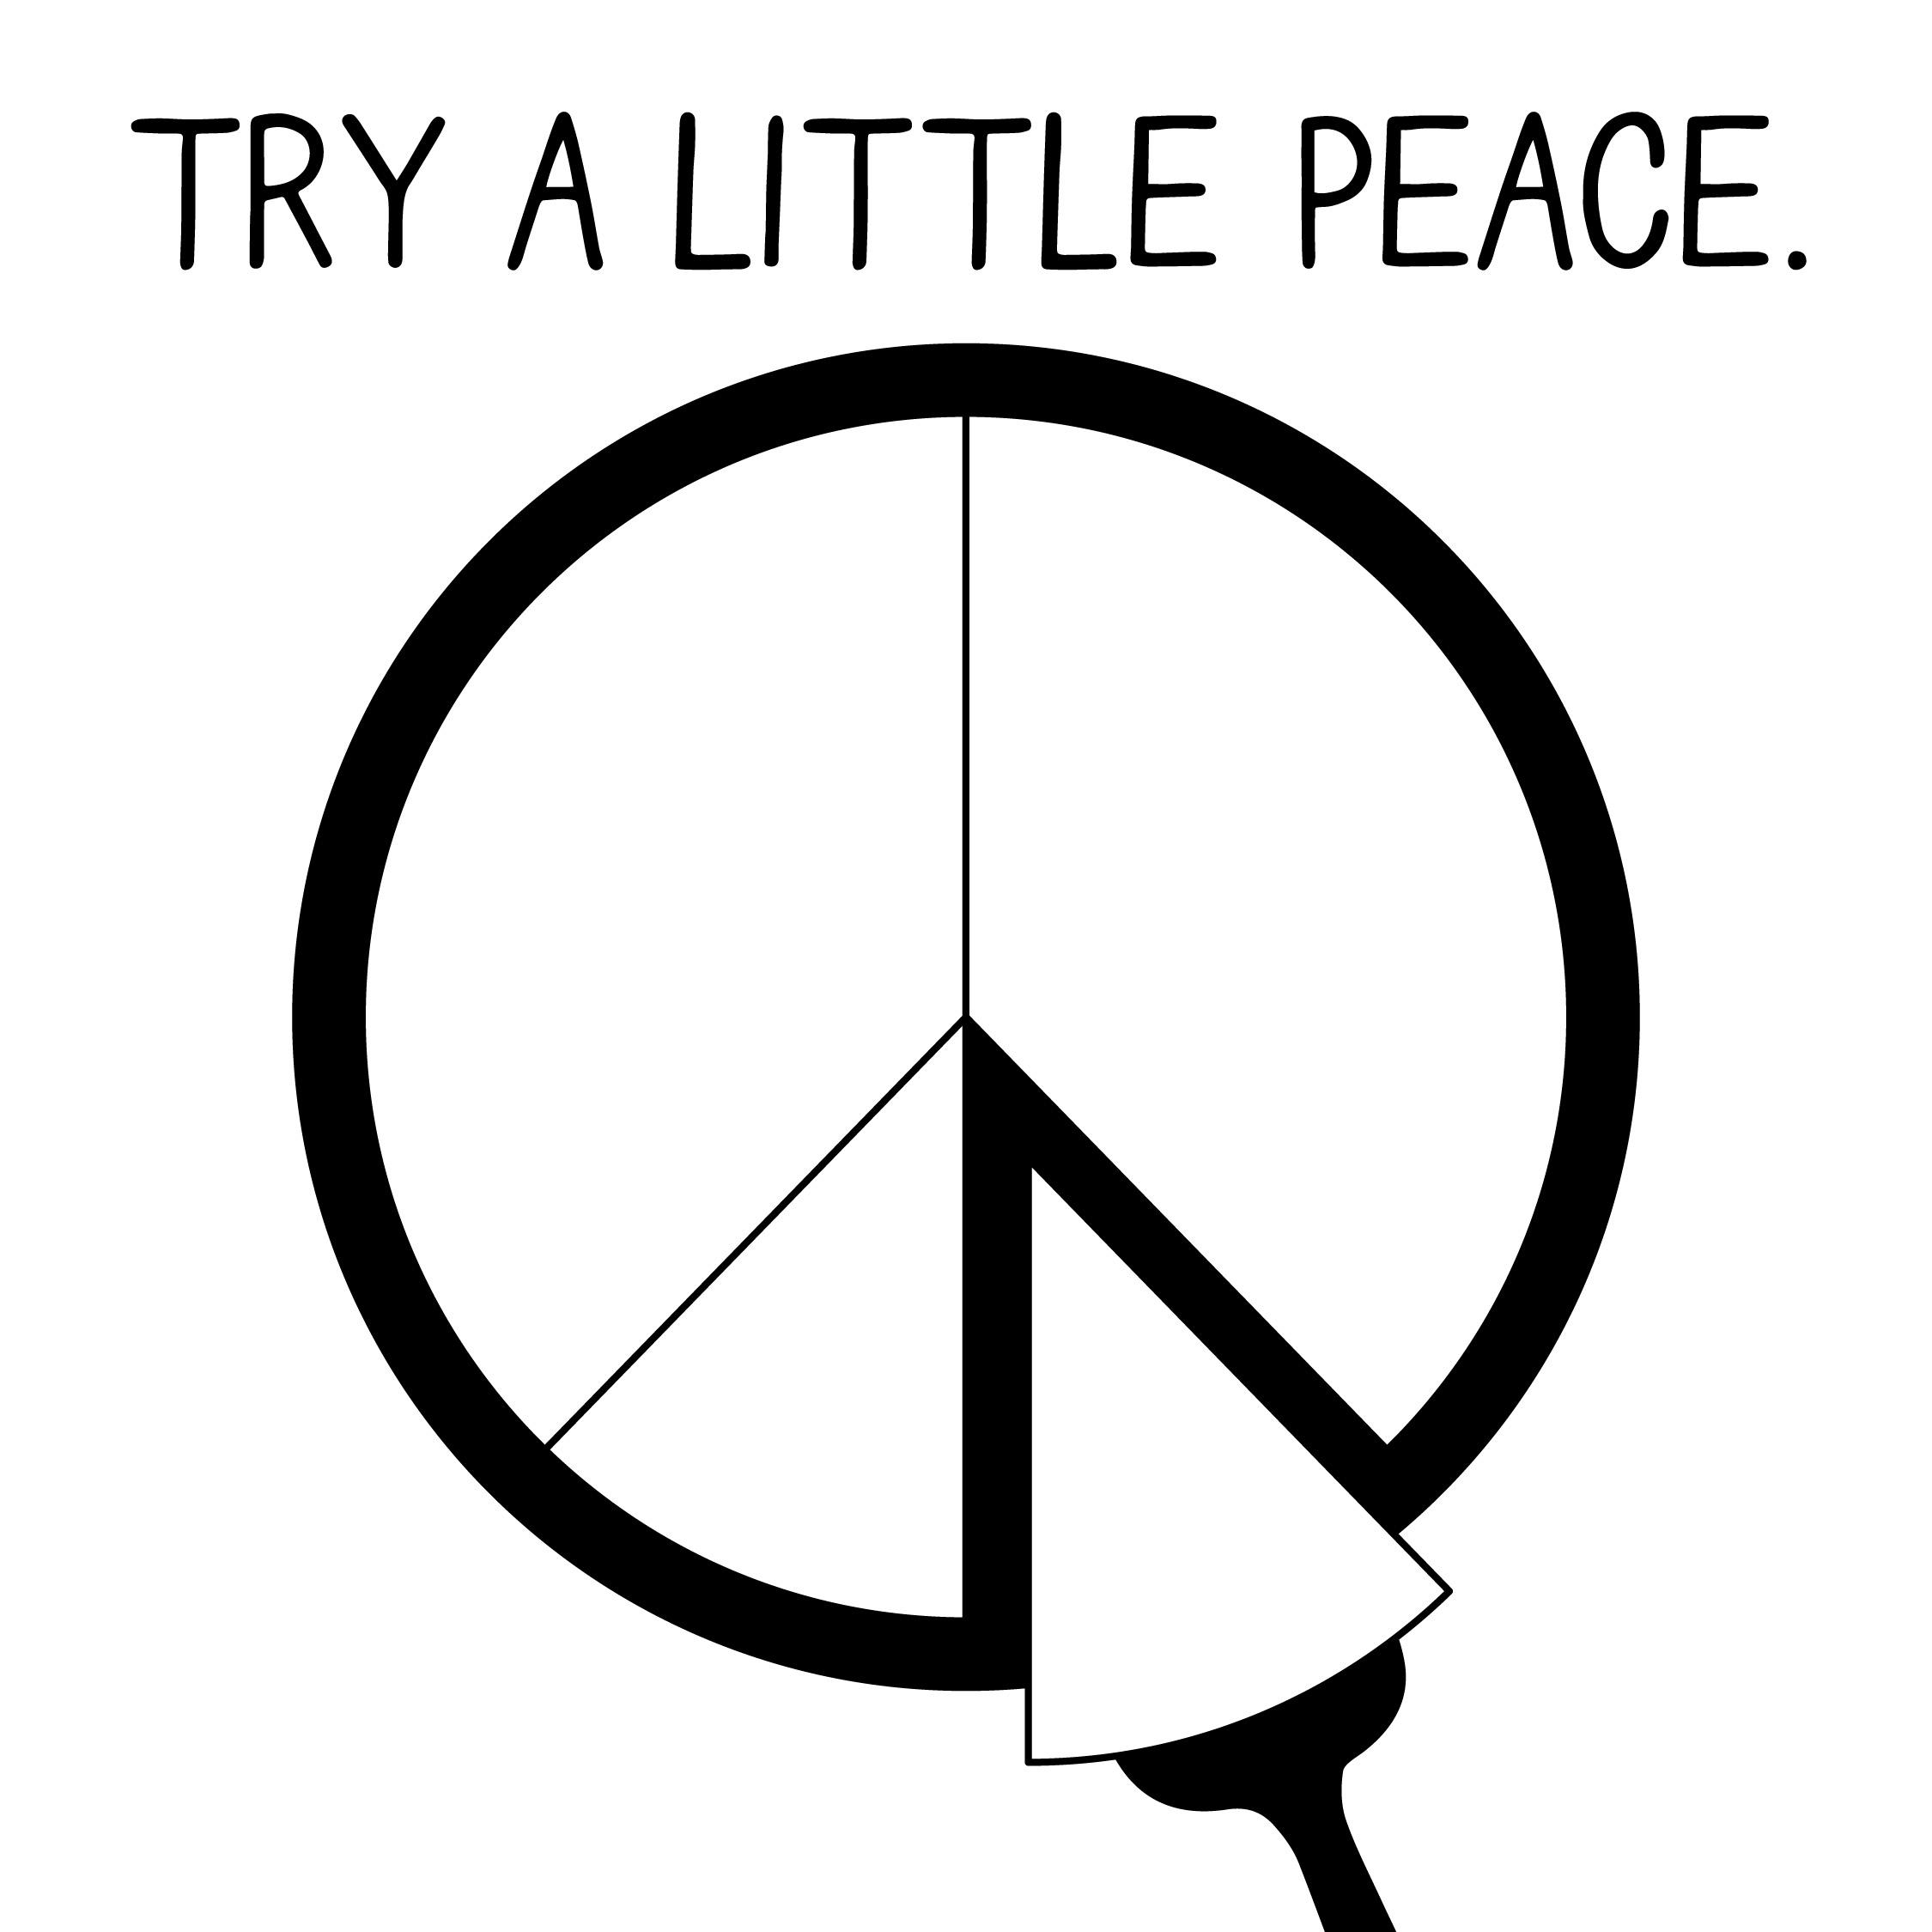 tryalittlepeace-01.jpg